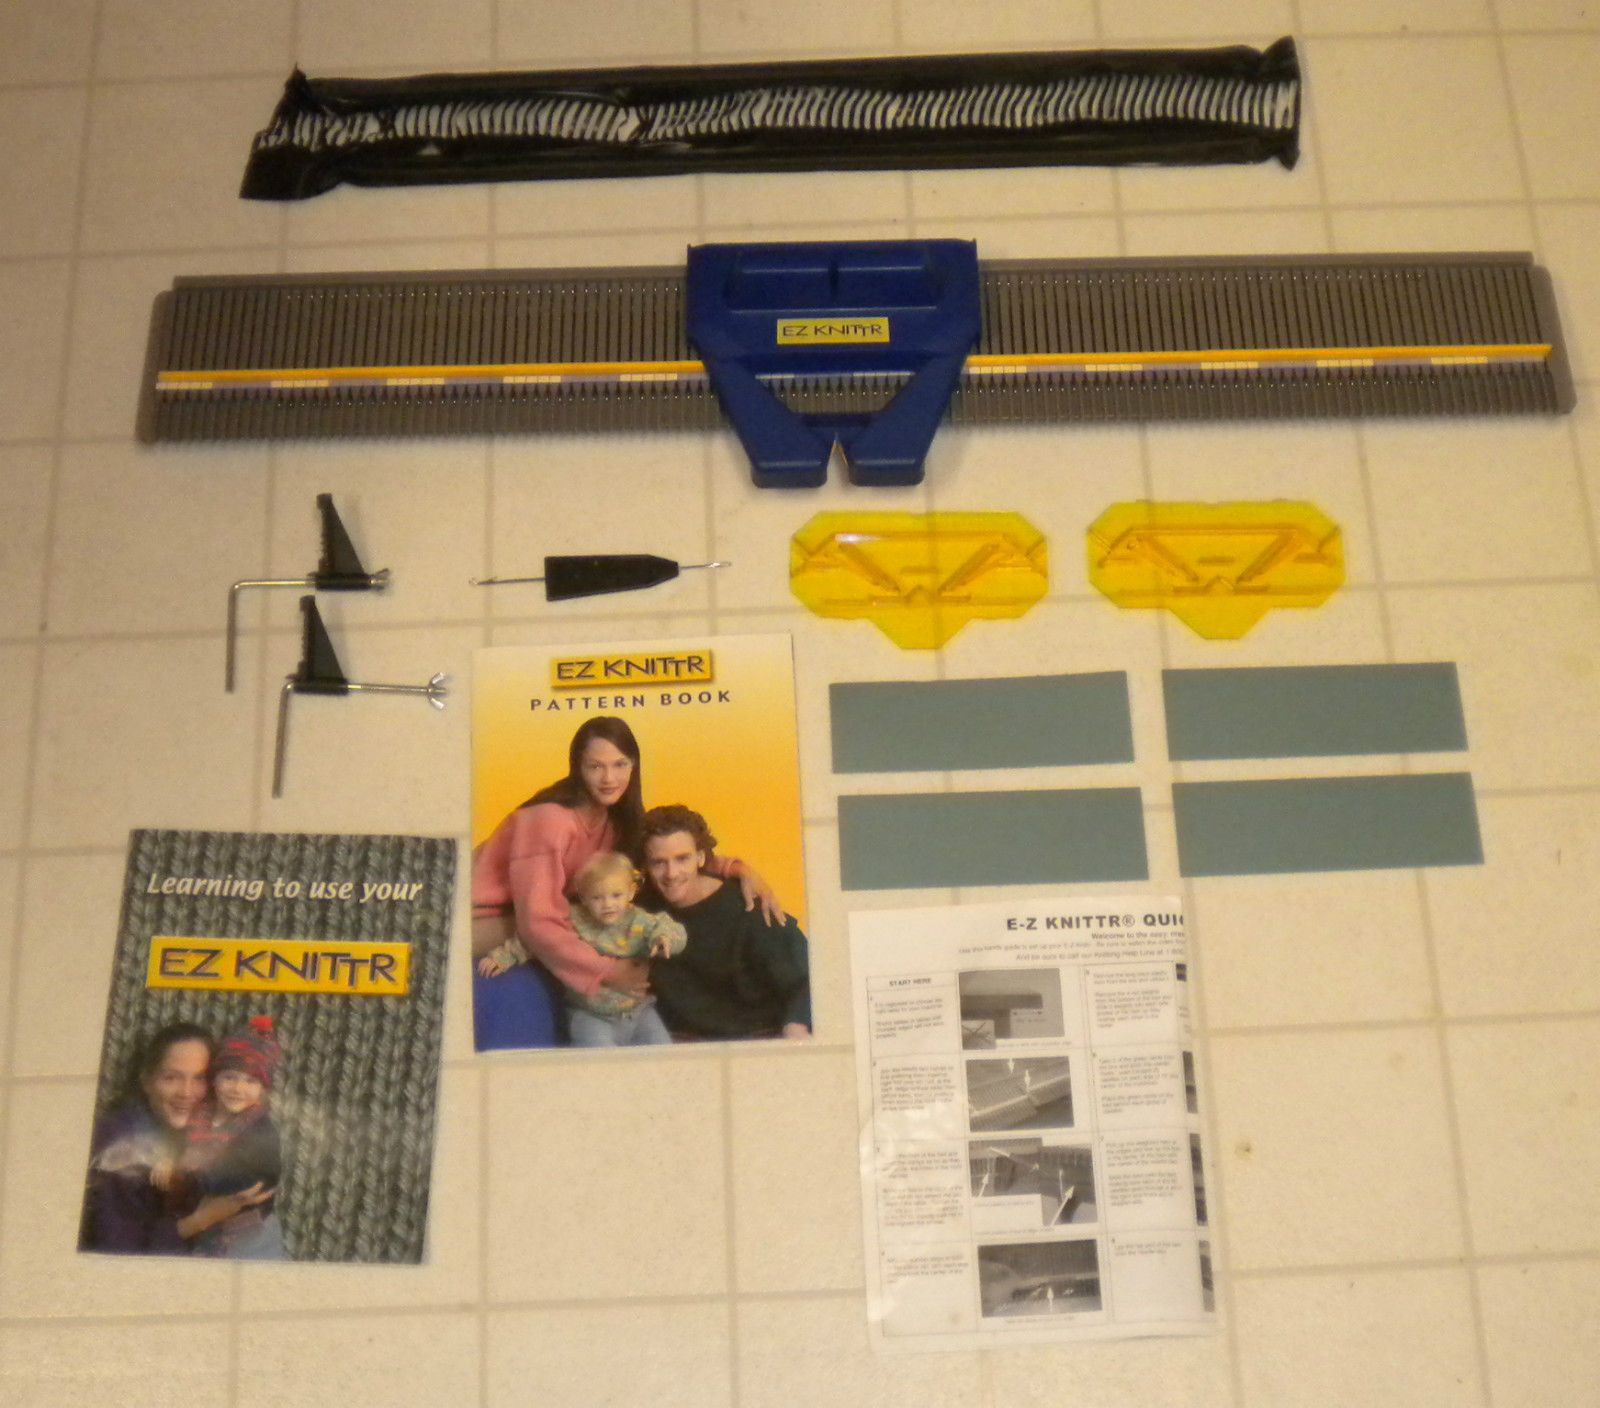 User Guide · Magazine · EZ Knittr Knitting Machine Easy Knitter - Similar  to Bond knitting machine Knitting Machine, Needlecrafts